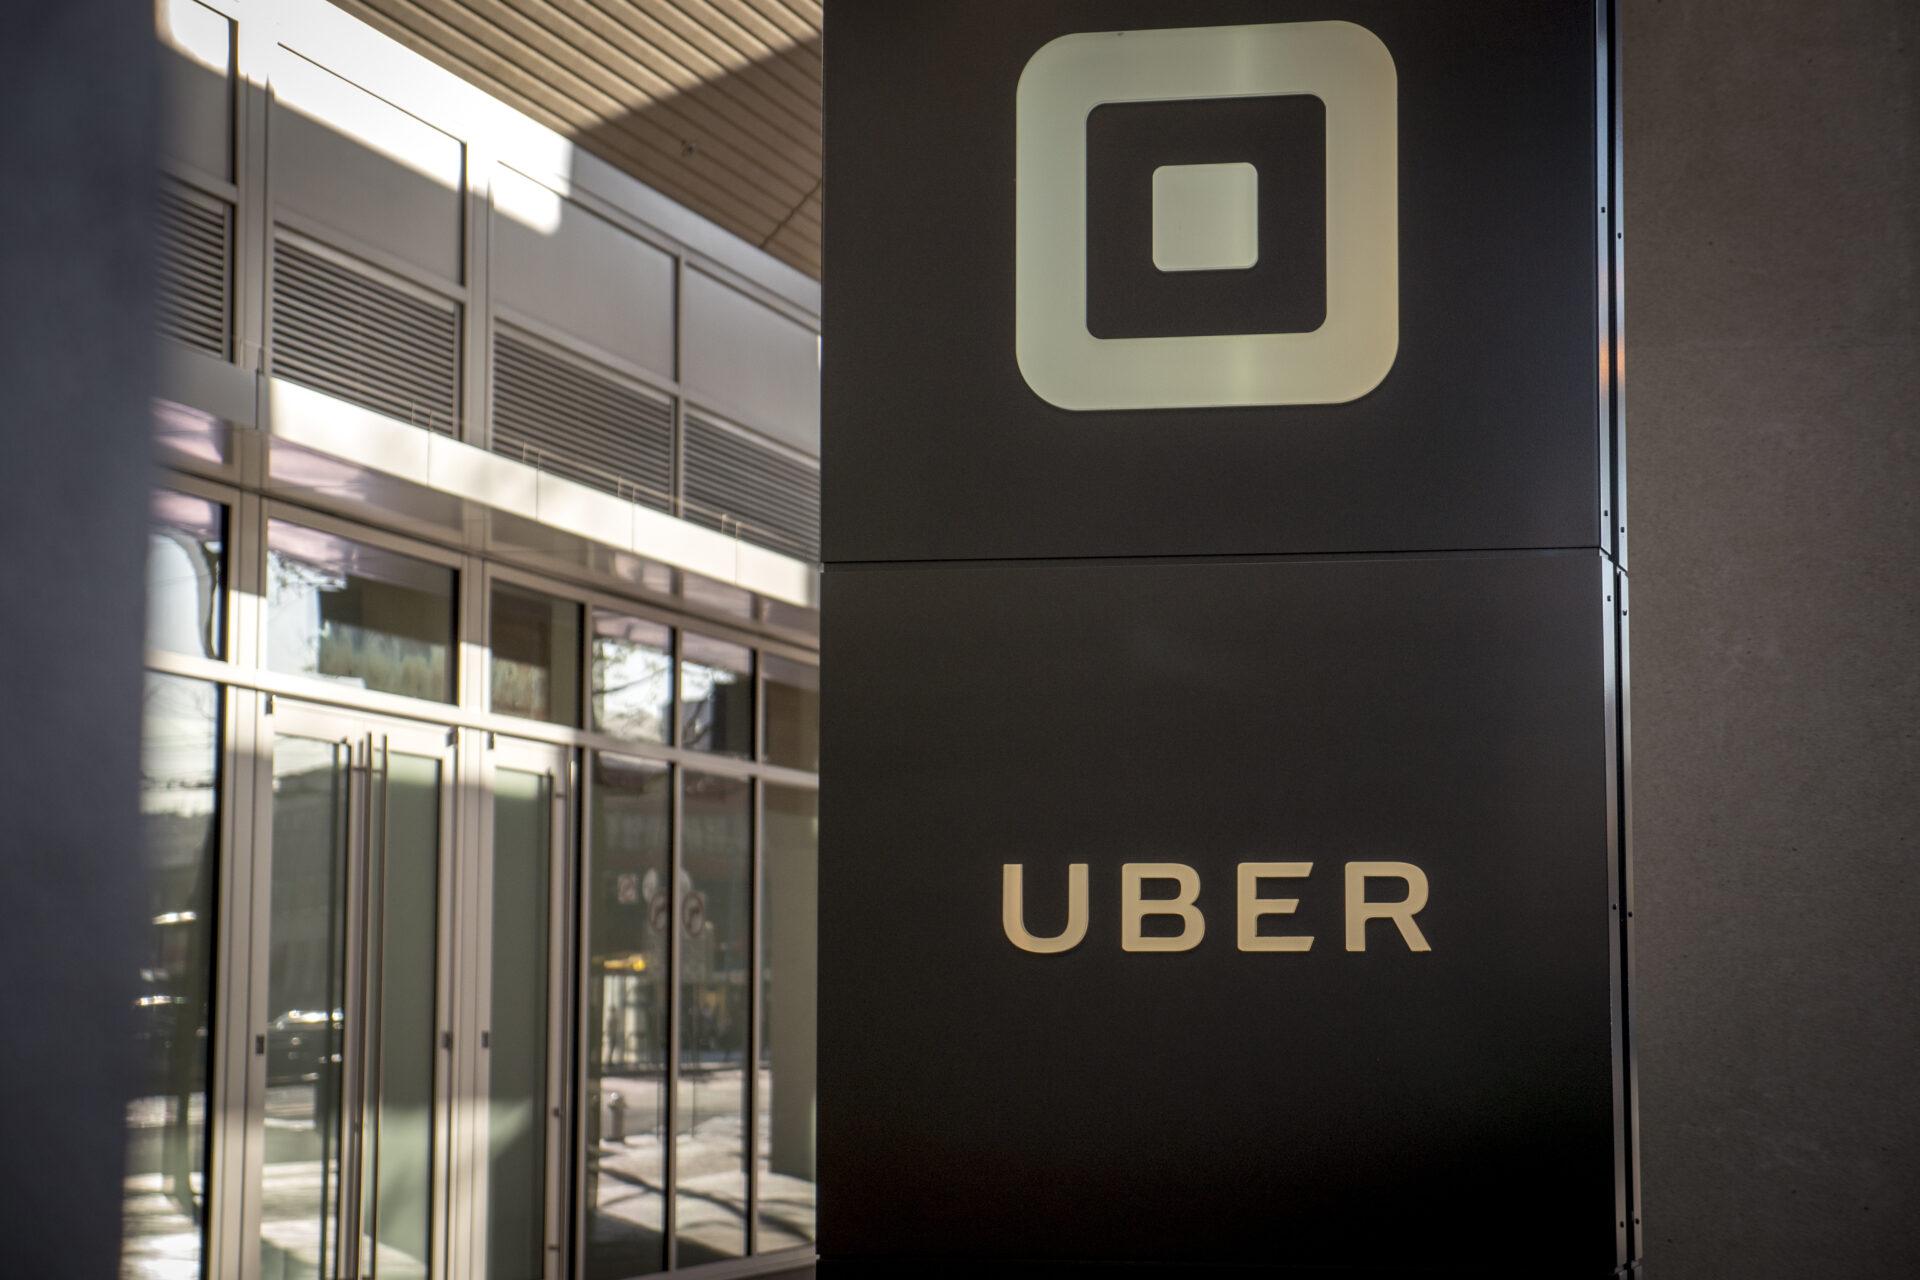 Criminal charges for Uber after European Court ruling